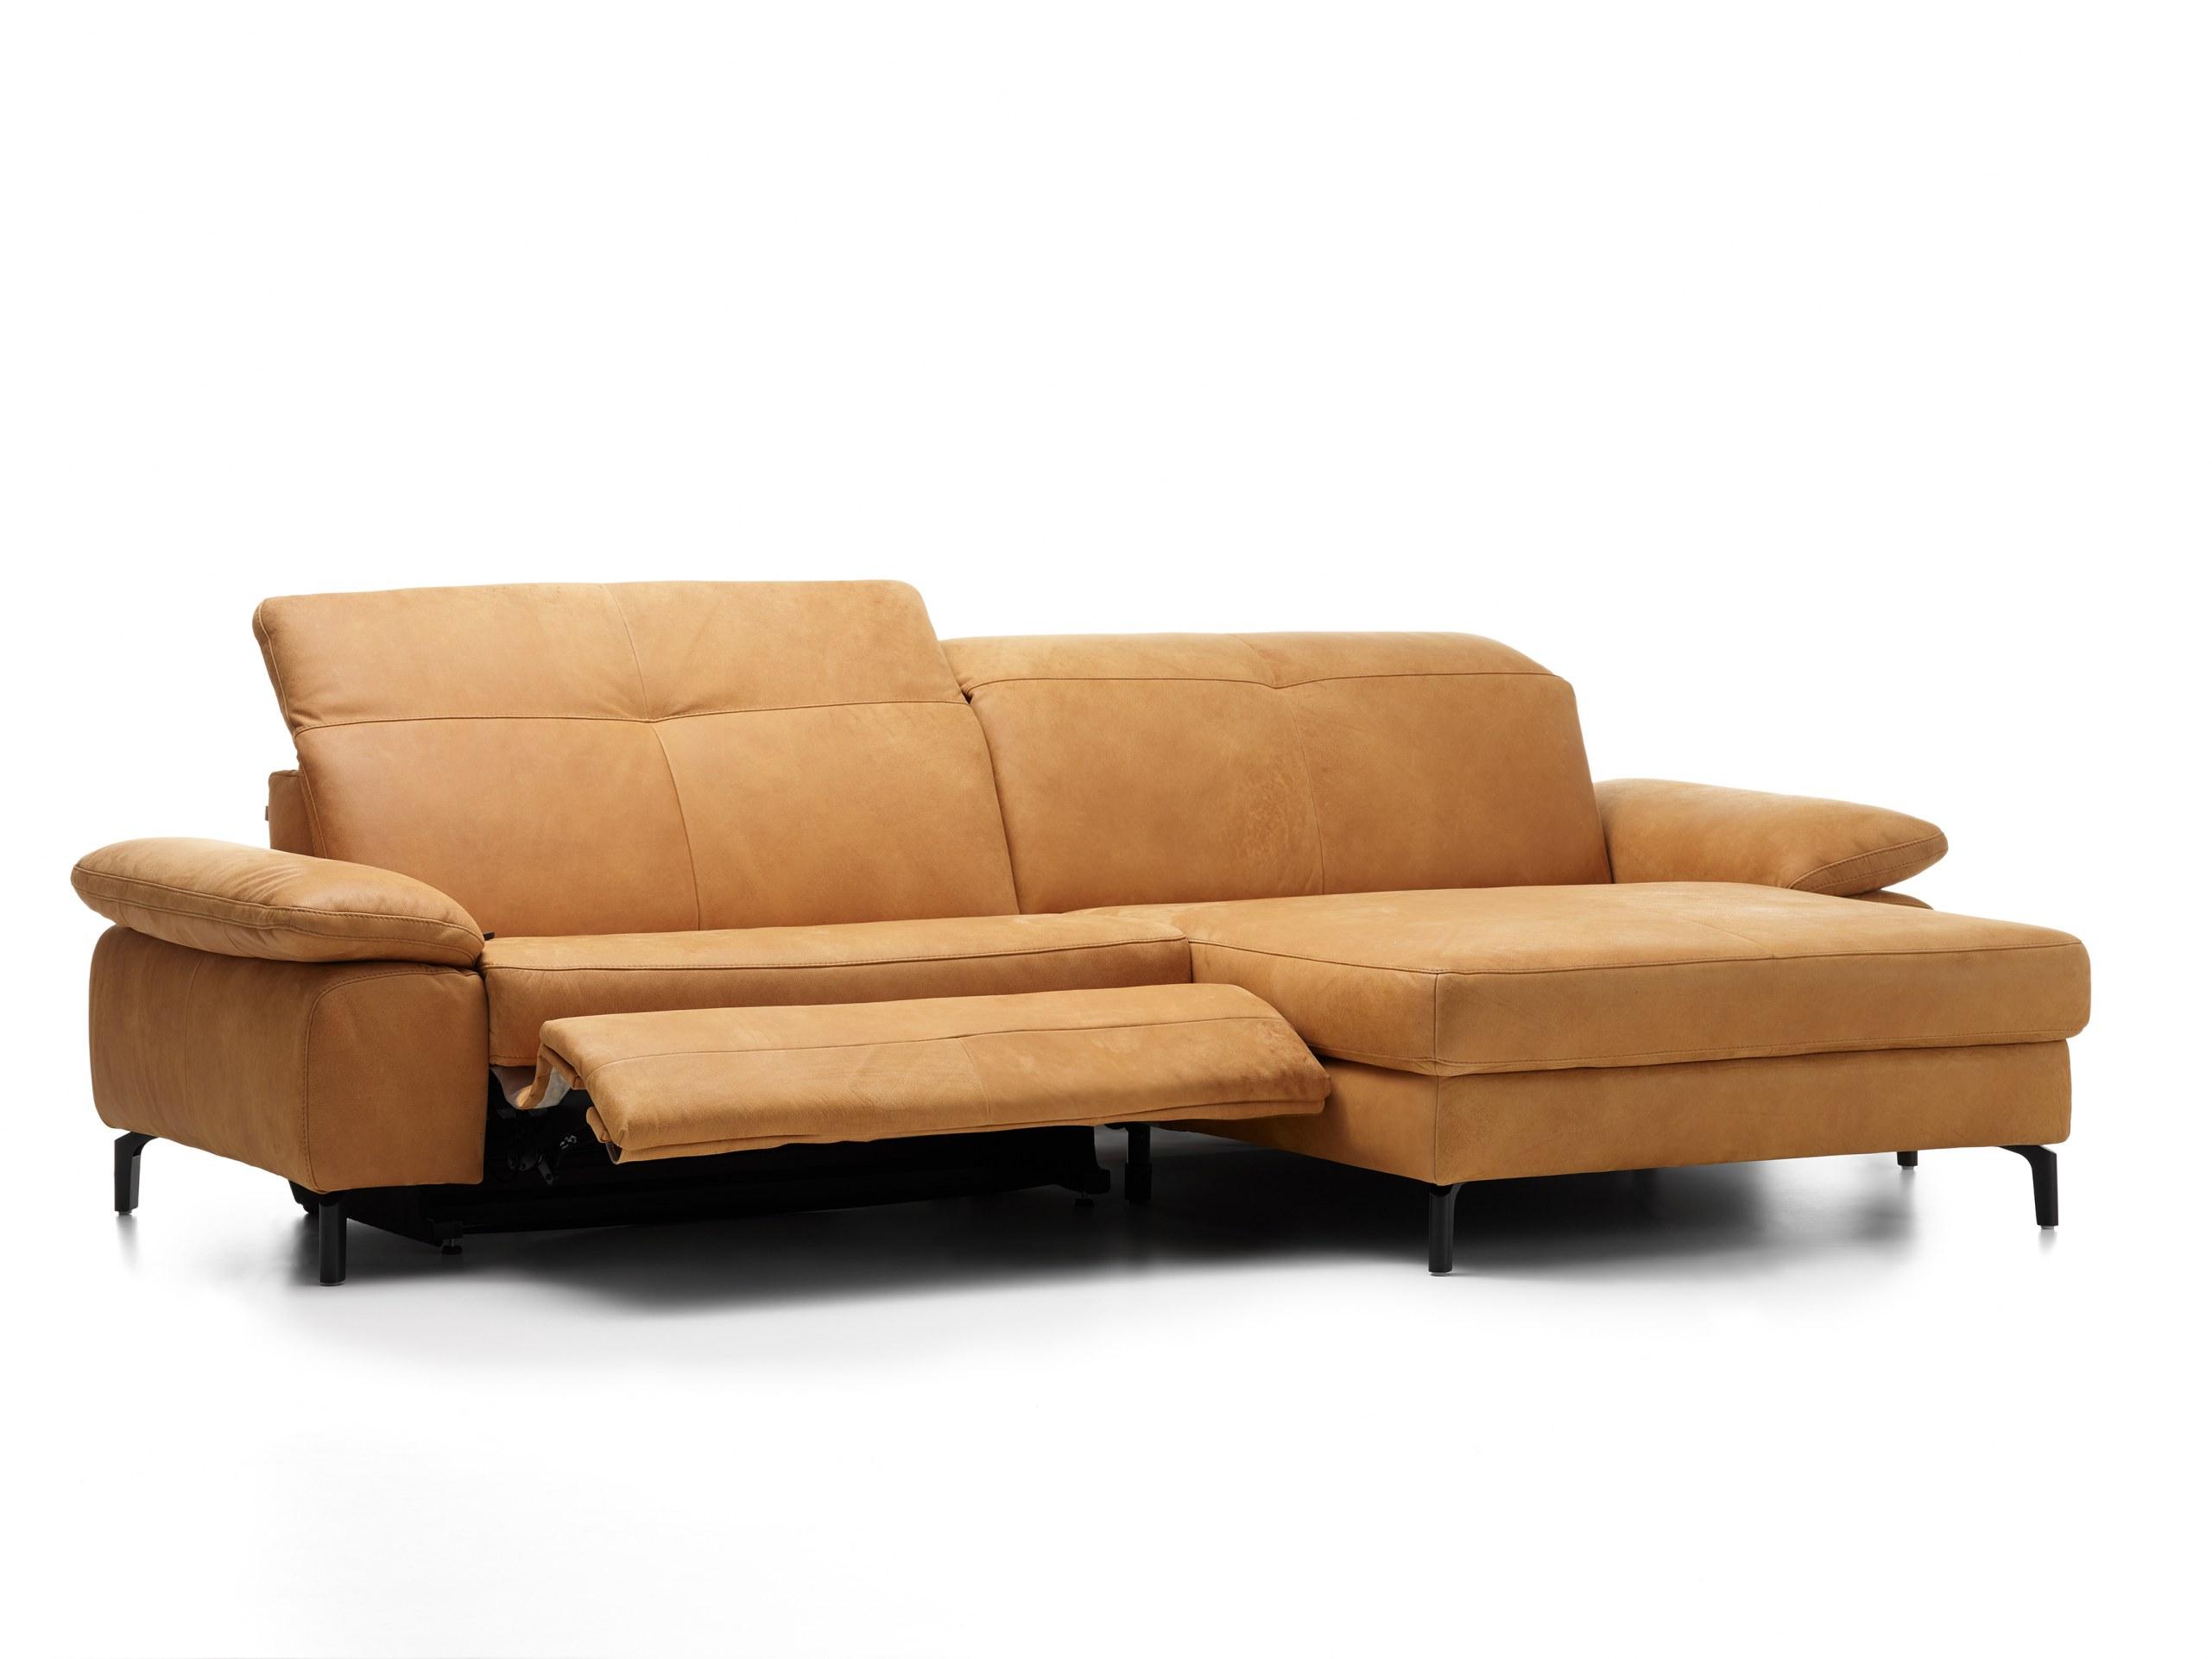 canapé davis cuire relax chaise longue